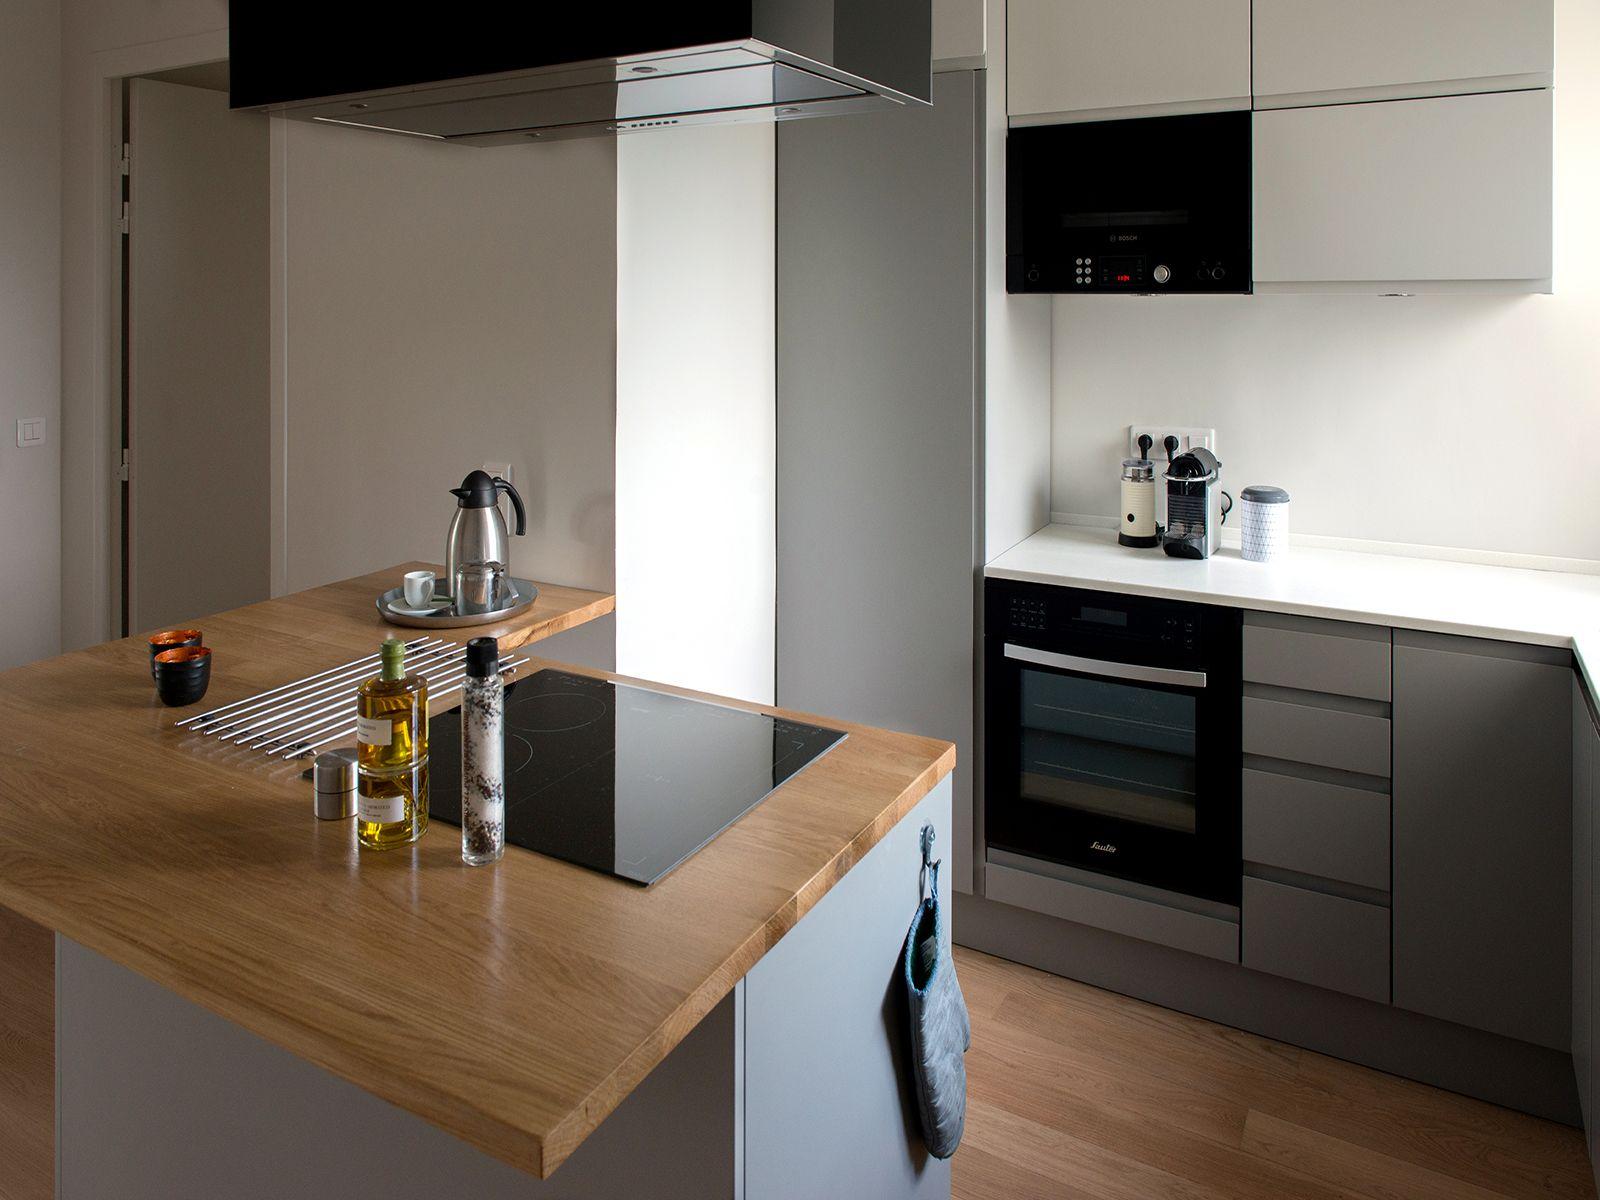 cuisine avec lot cuisson r alisation murs merveilles i grey kitchen with island by murs. Black Bedroom Furniture Sets. Home Design Ideas